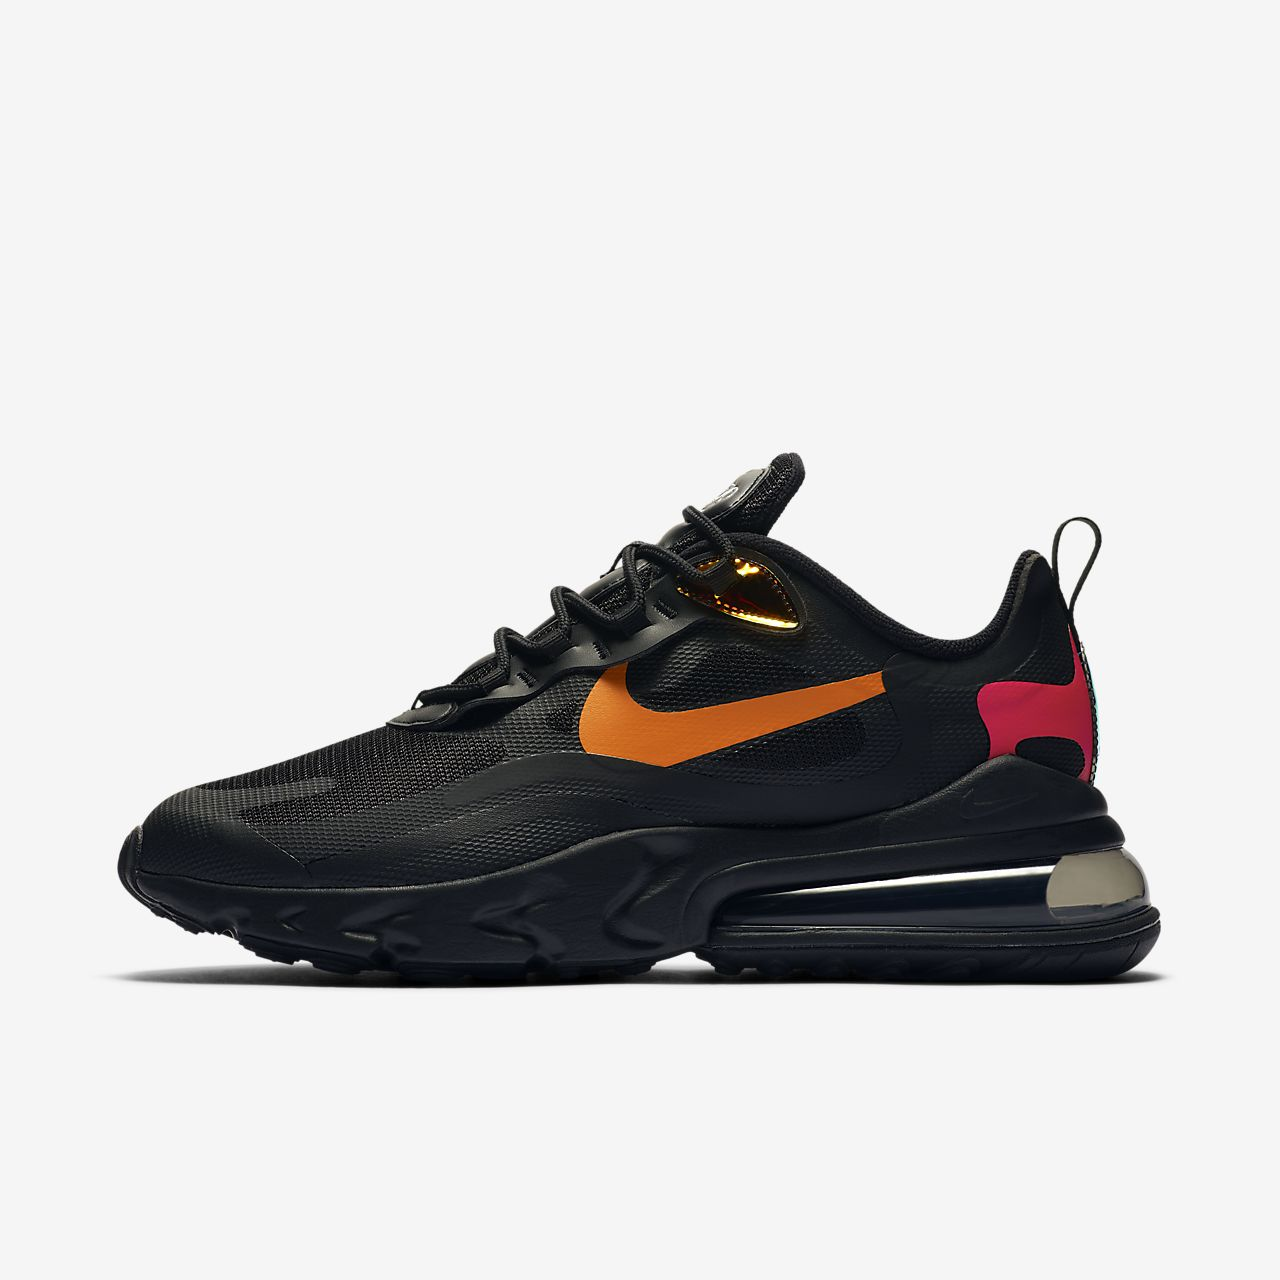 Nike Air Max 270 React sko til mænd